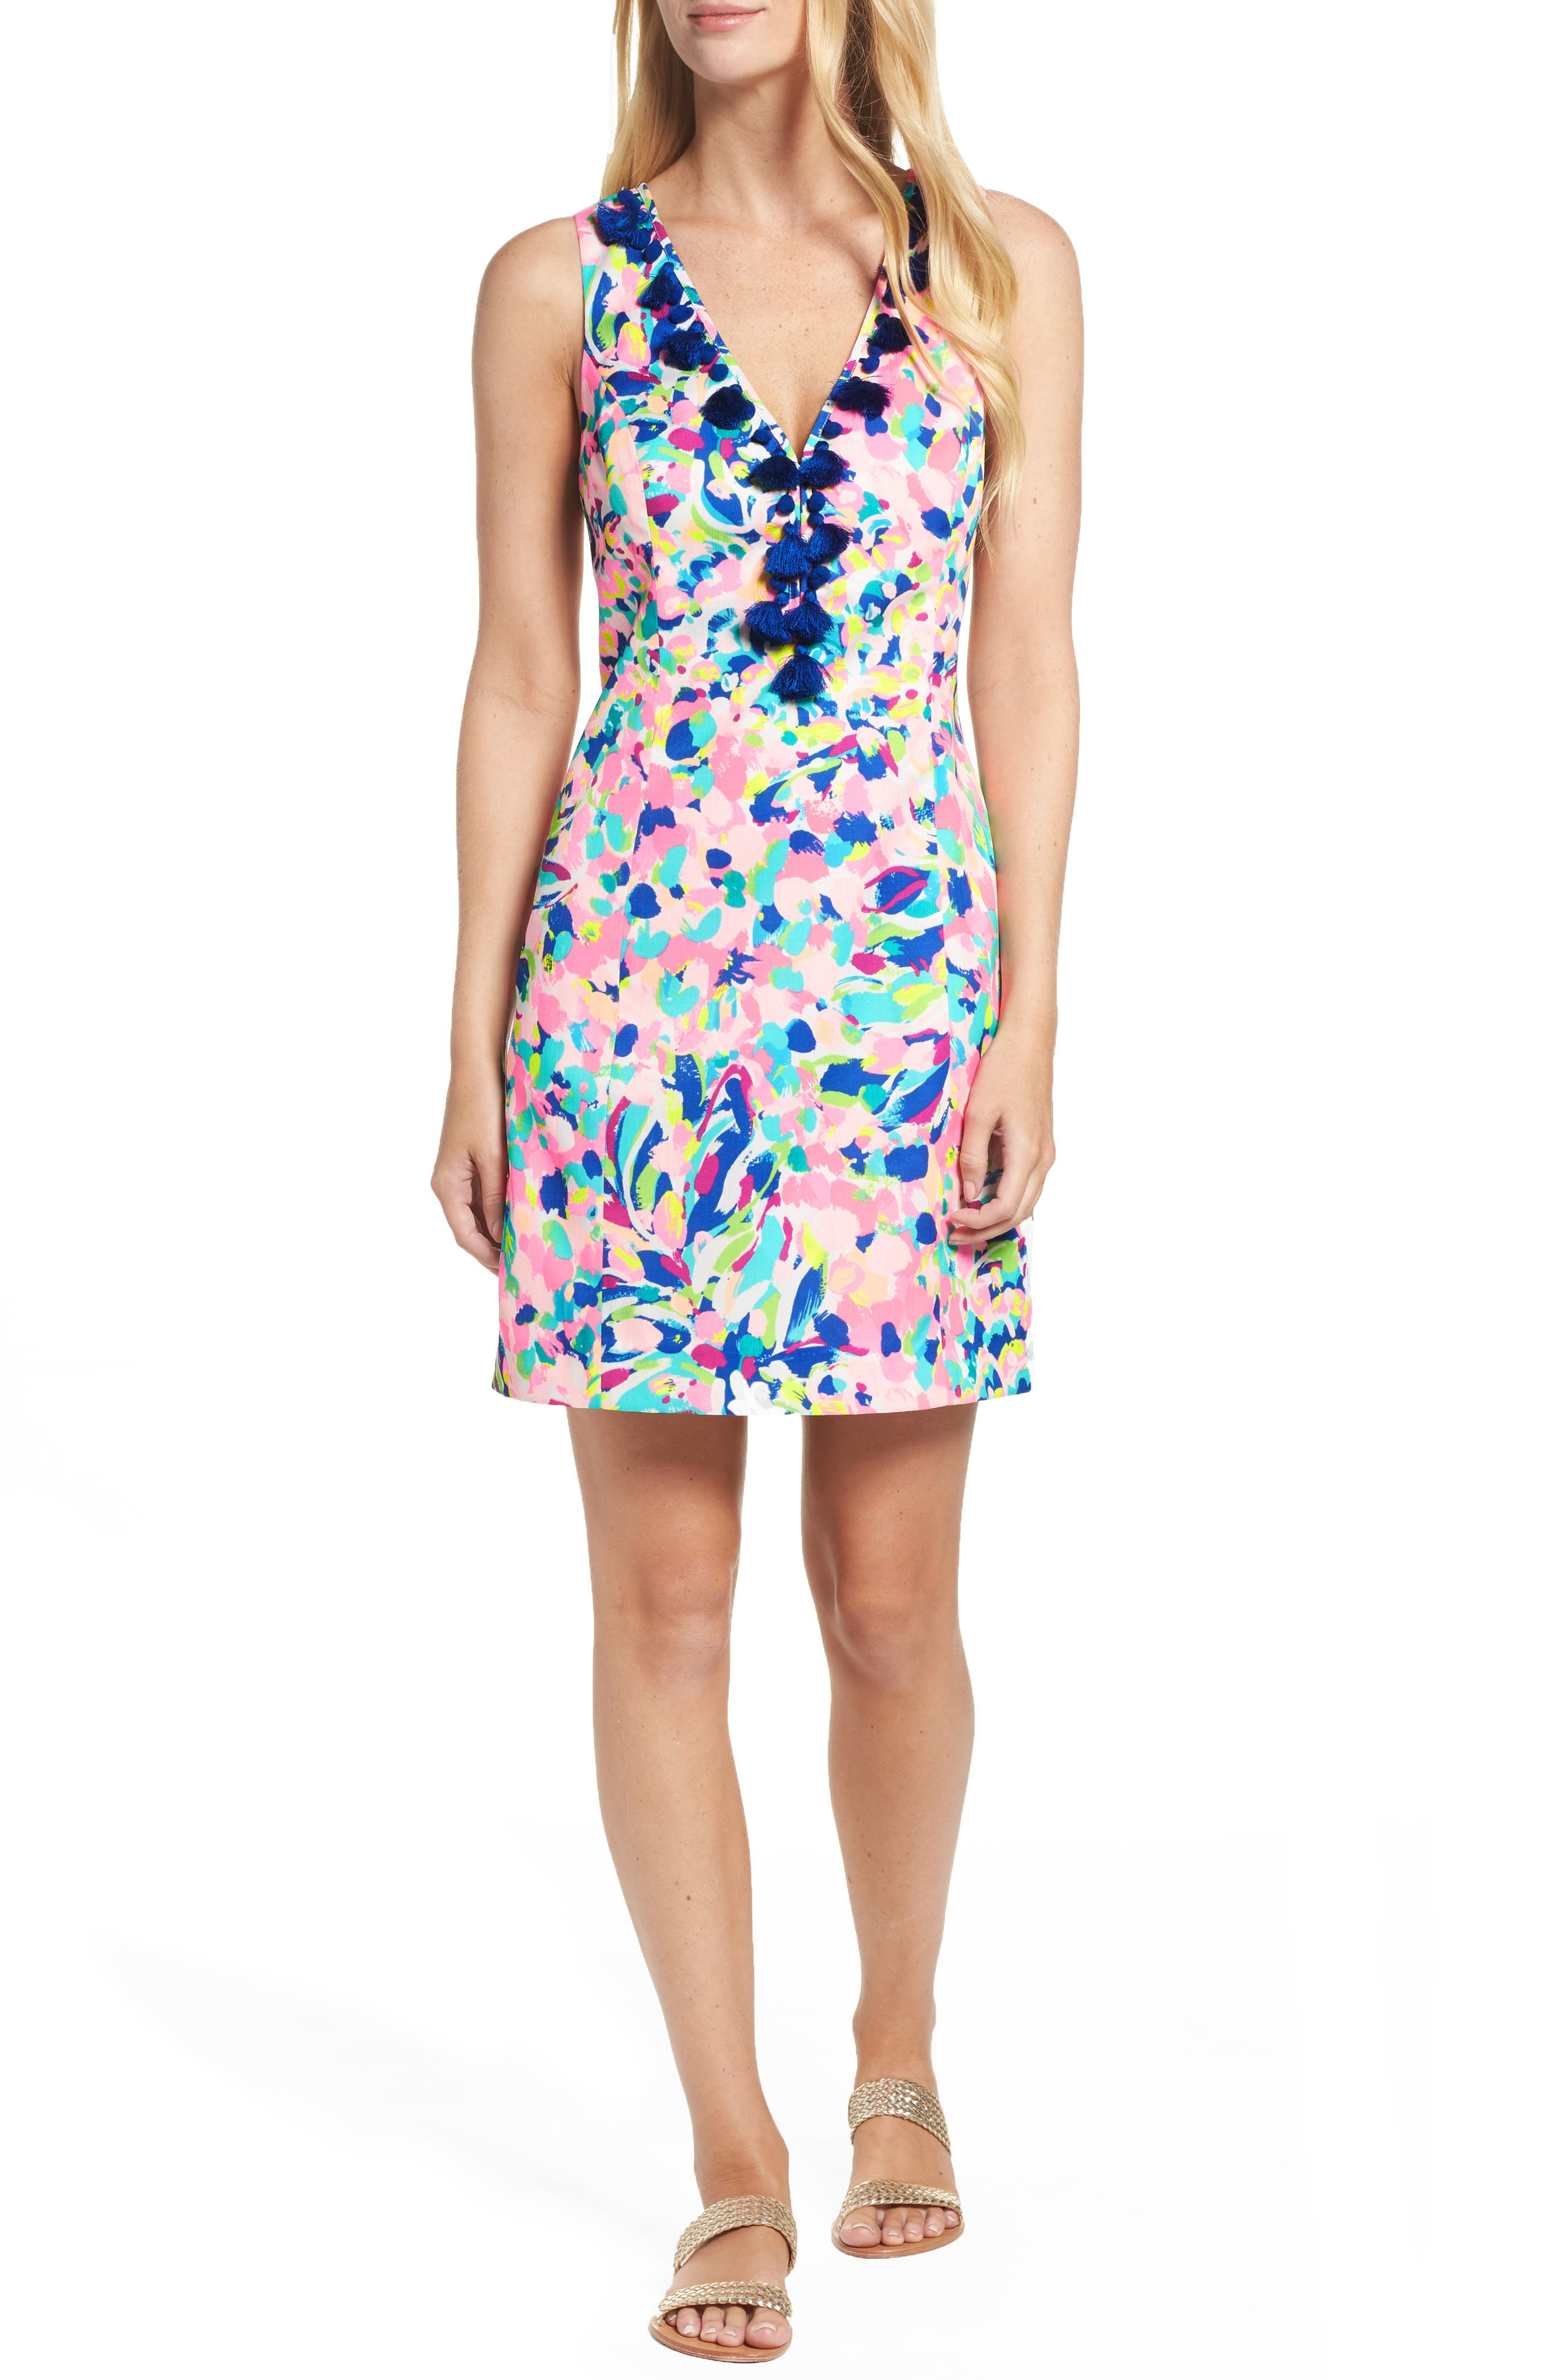 Cabrey Sheath Dress,                             Main thumbnail 1, color,                             698